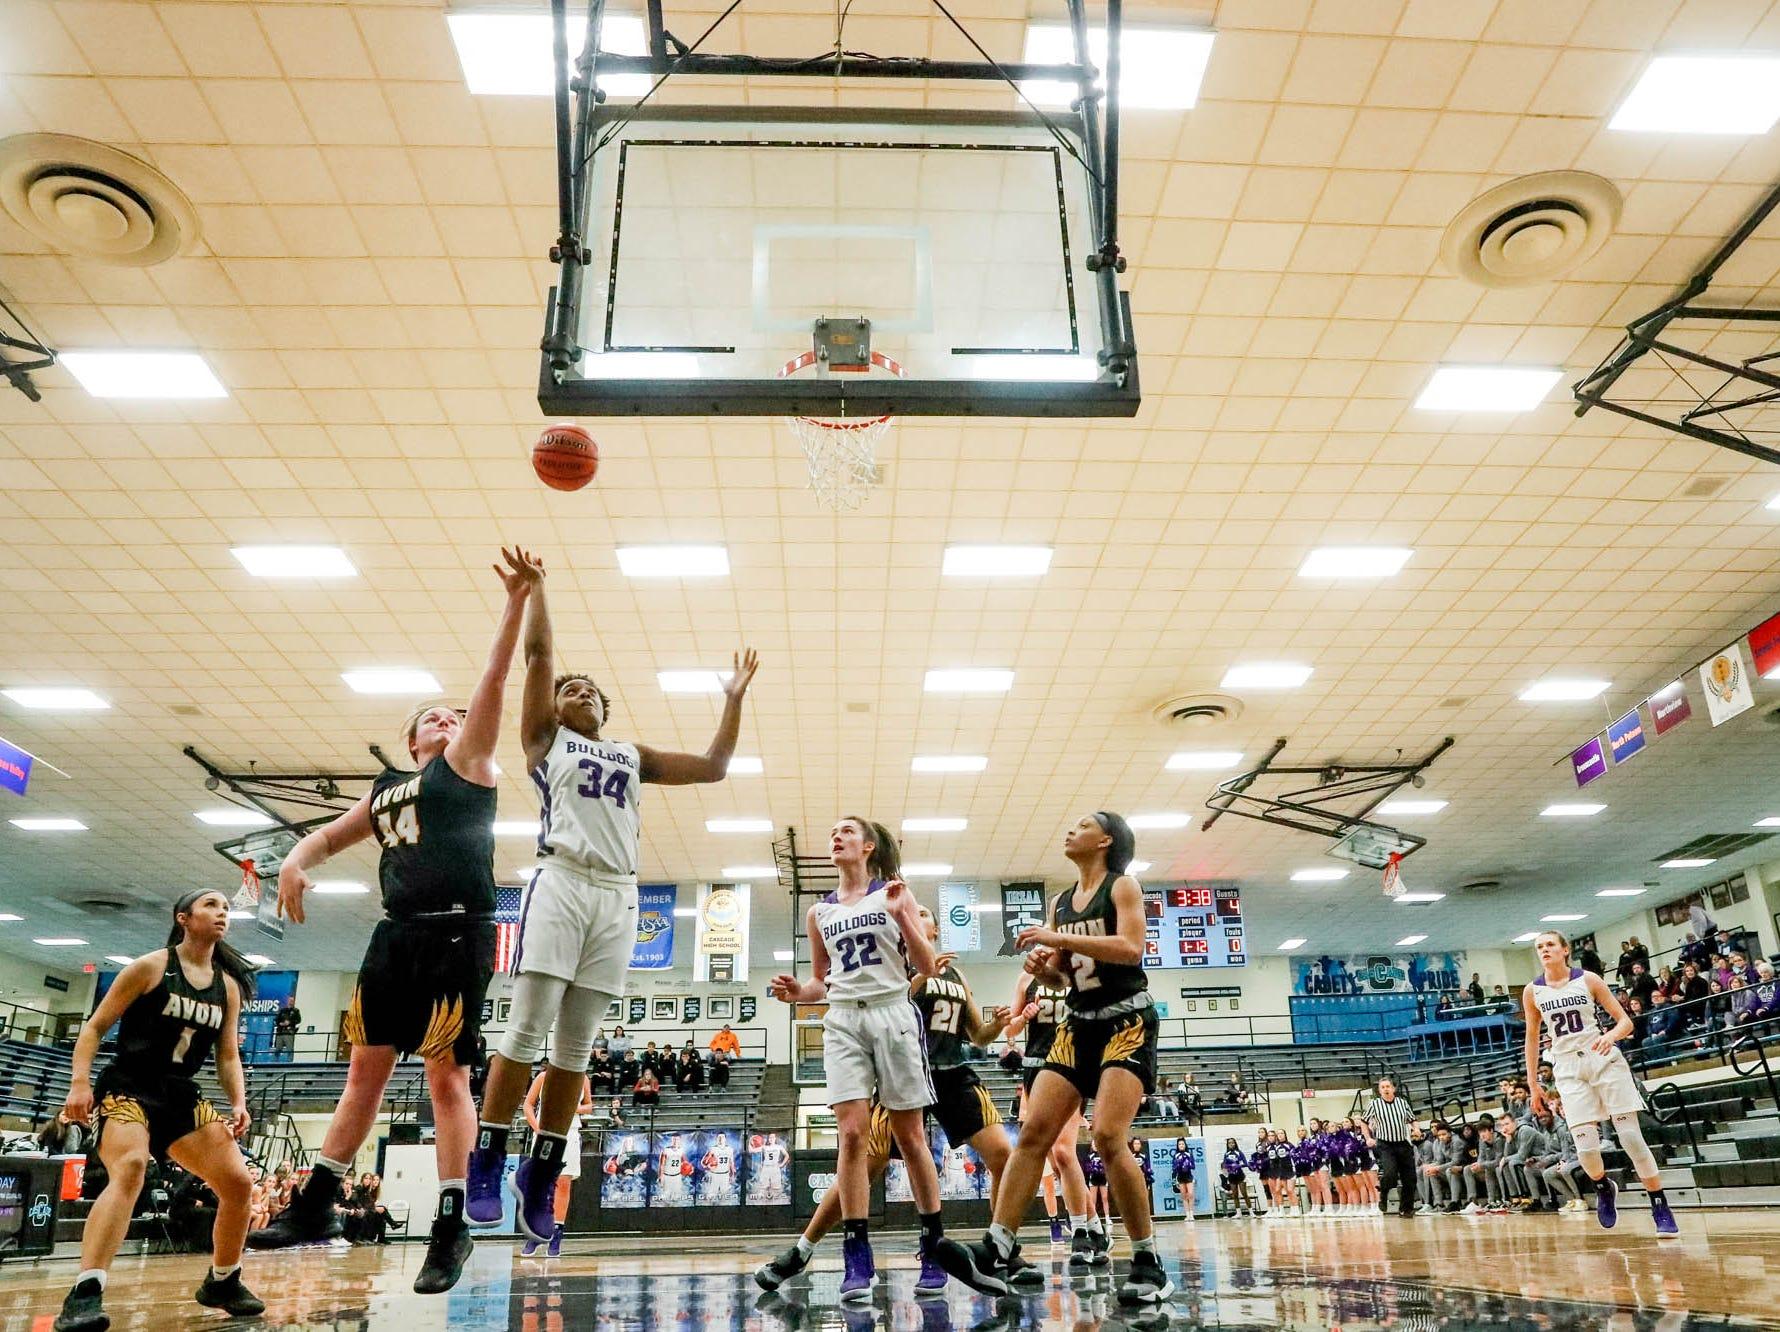 Avon High School's Haley Nichols (44), tries to block a shot by Brownsburg High School's Aminah Thomas (34), during the 2019 Hendricks County Basketball Tournament game between the Avon High School girls varsity basketball team and Brownsburg High School, held at Cascade High School on Saturday, Jan. 5, 2019. The final score was 69-44.